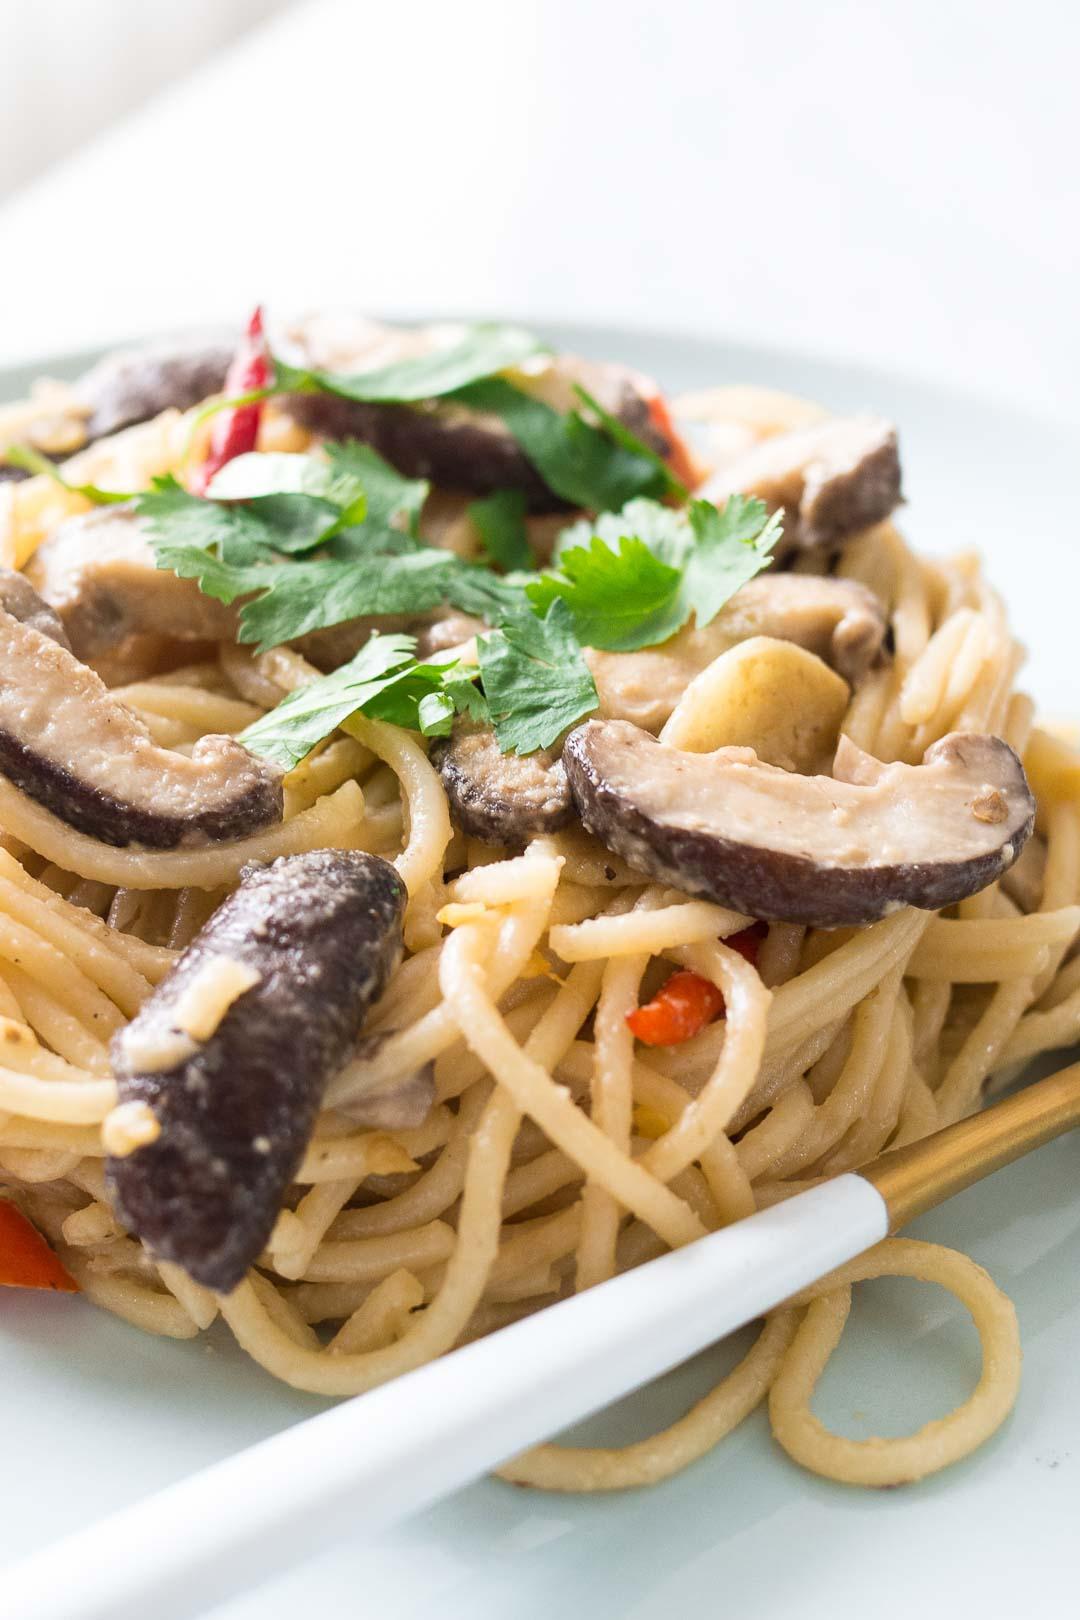 miso spaghetti with shiitake mushrooms in a blue dish